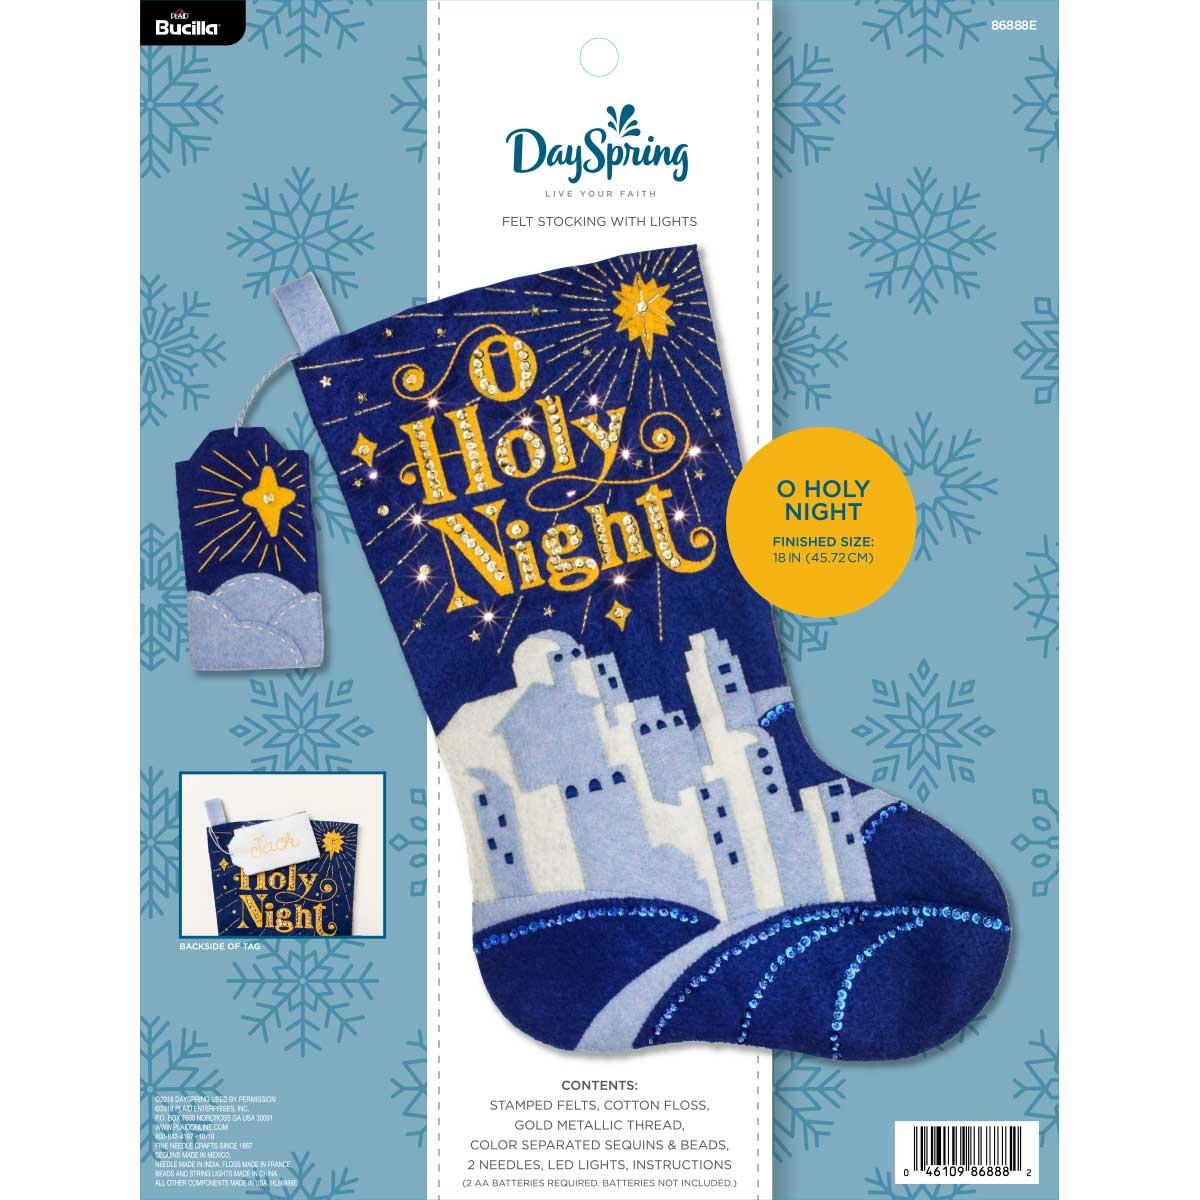 Bucilla ® Seasonal - Felt - Stocking Kits - DaySpring - O Holy Night with Lights